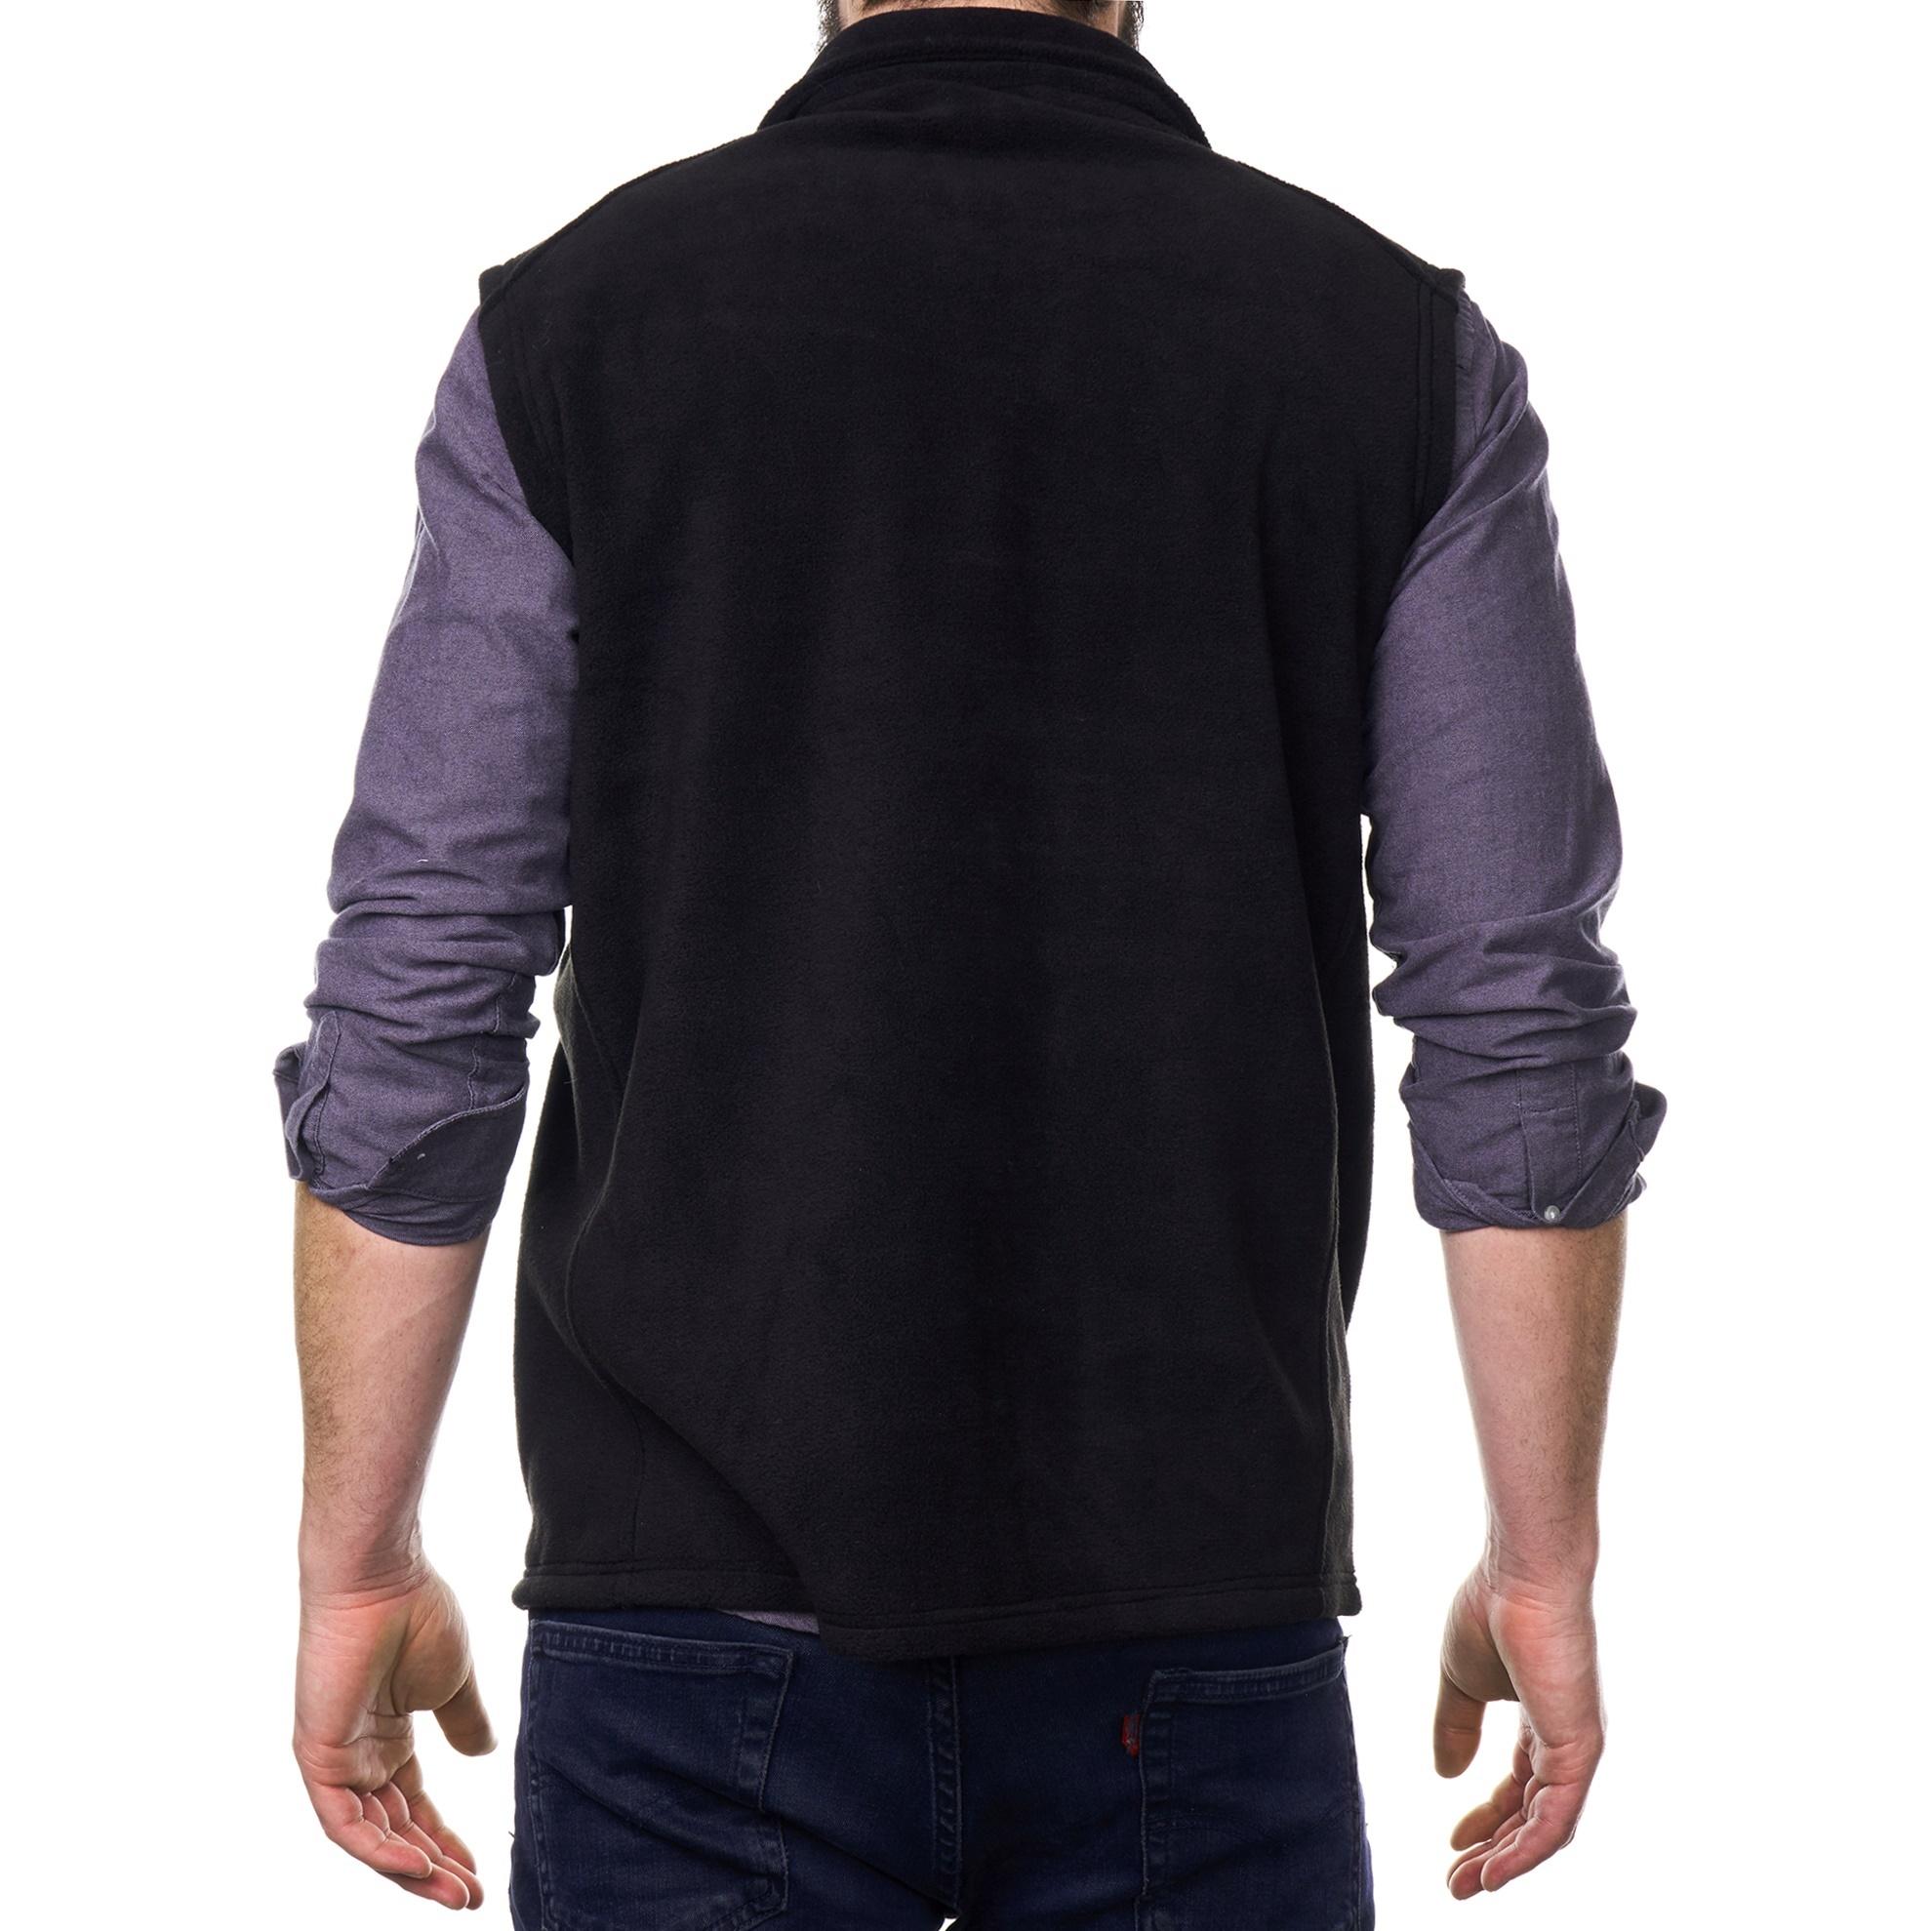 Alpine-Swiss-Mens-Full-Zip-Up-Fleece-Vest-Lightweight-Warm-Sleeveless-Jacket thumbnail 17